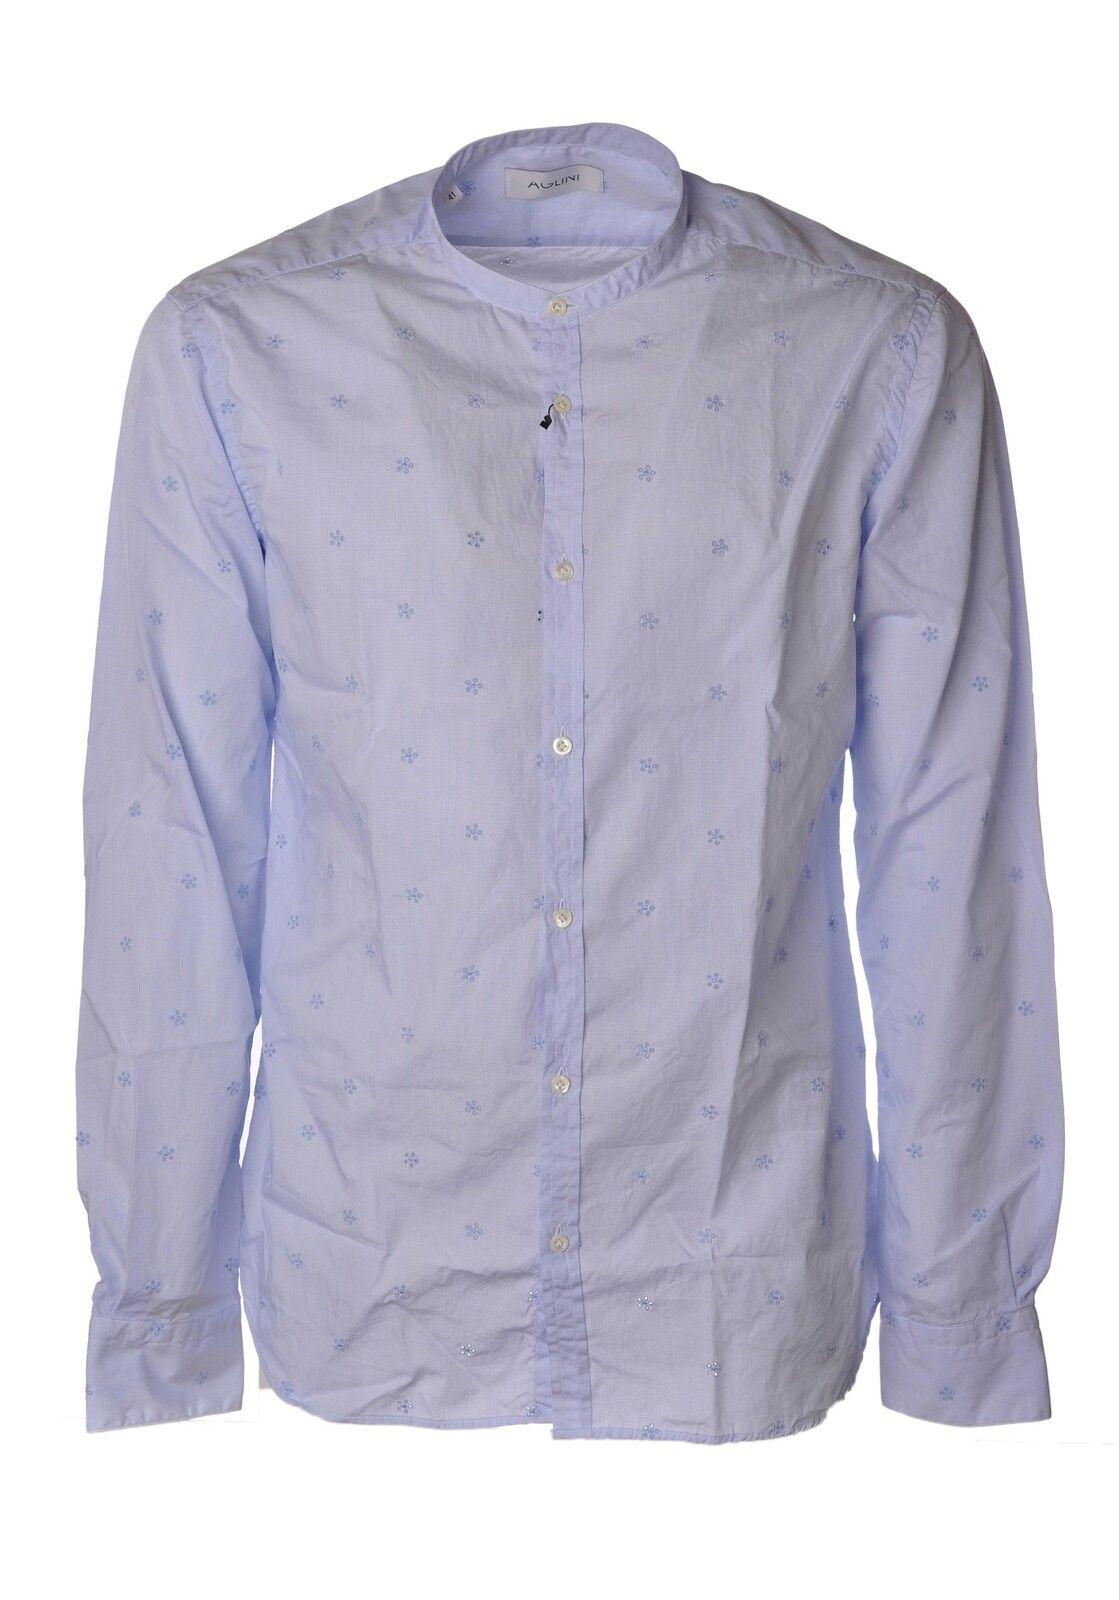 Aglini  -  Camiseta - Hombre - Azul - 3817929A180752